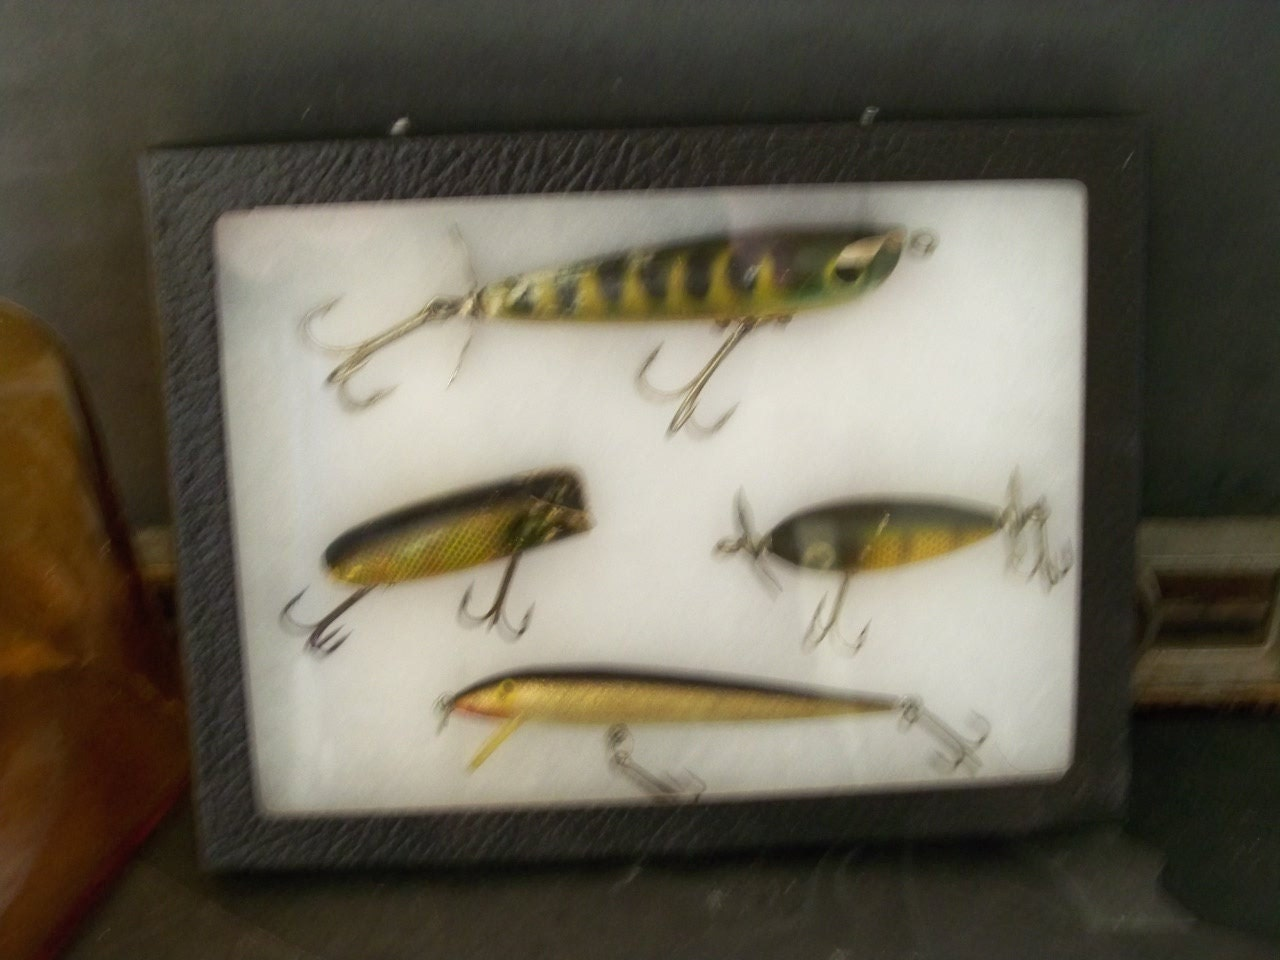 Fishing lure display vintage mid century and classic by for Fishing lure display